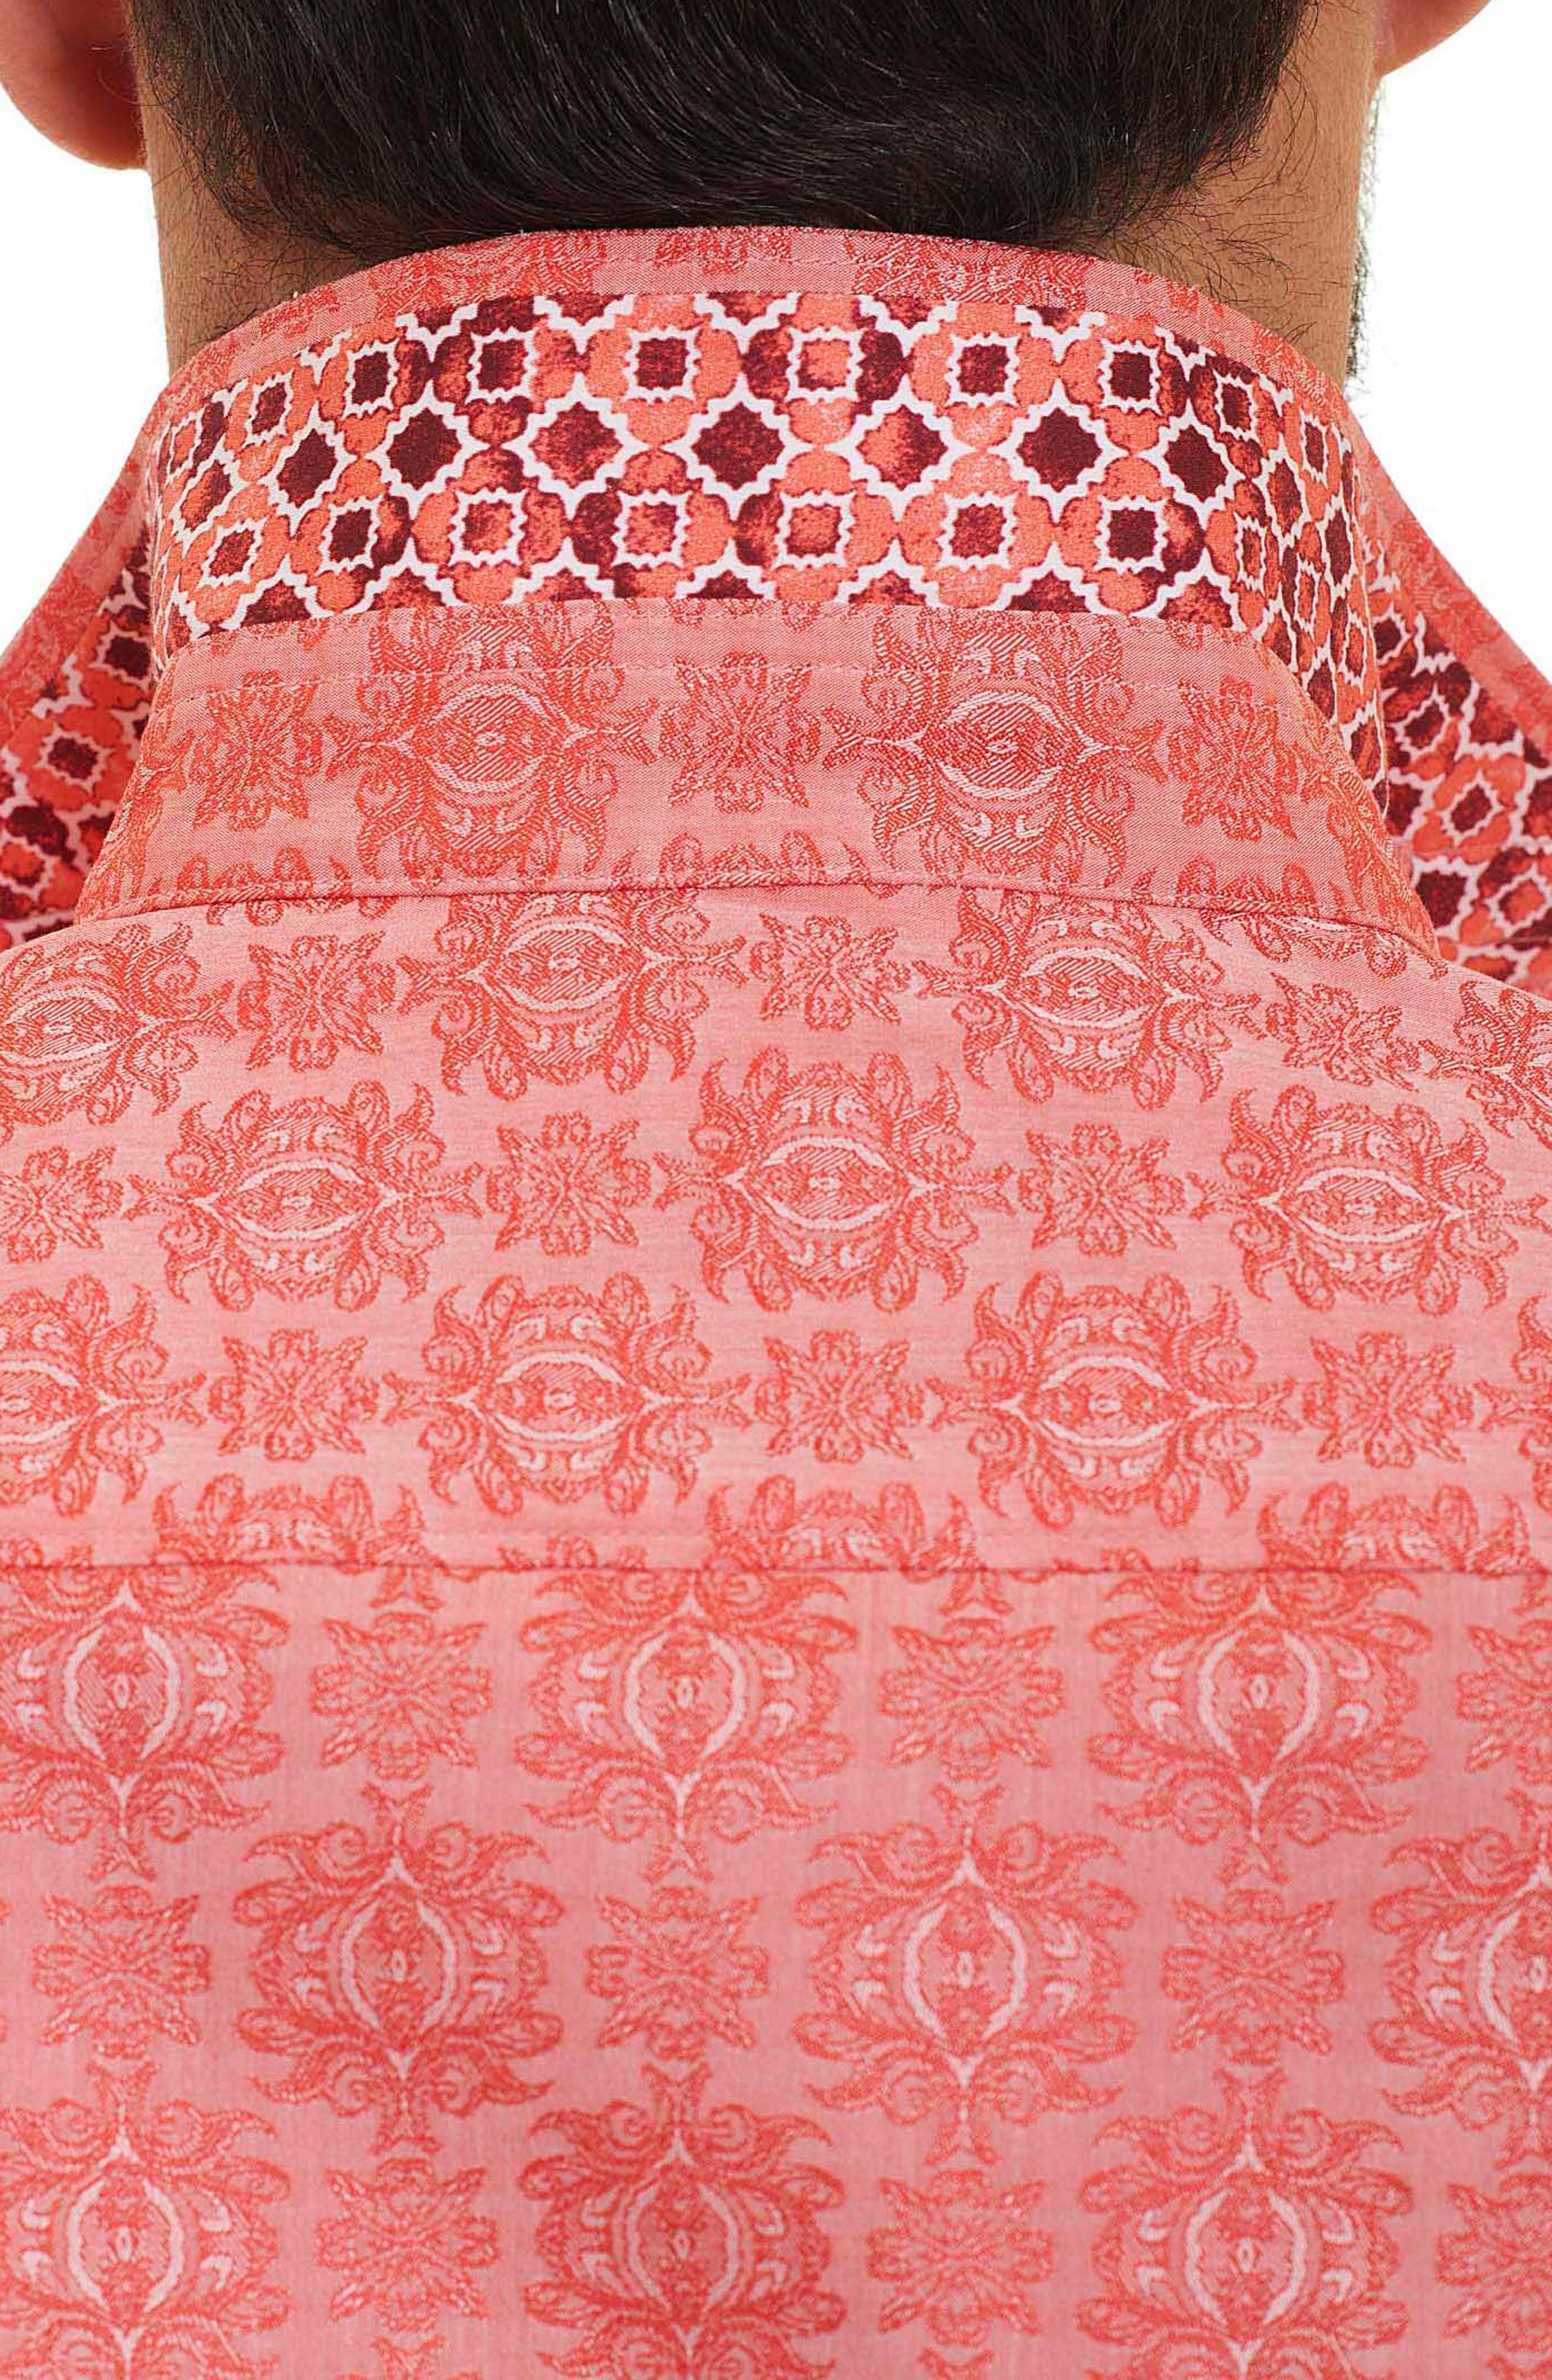 Cullen Regular Fit Sport Shirt,                             Alternate thumbnail 4, color,                             Coral